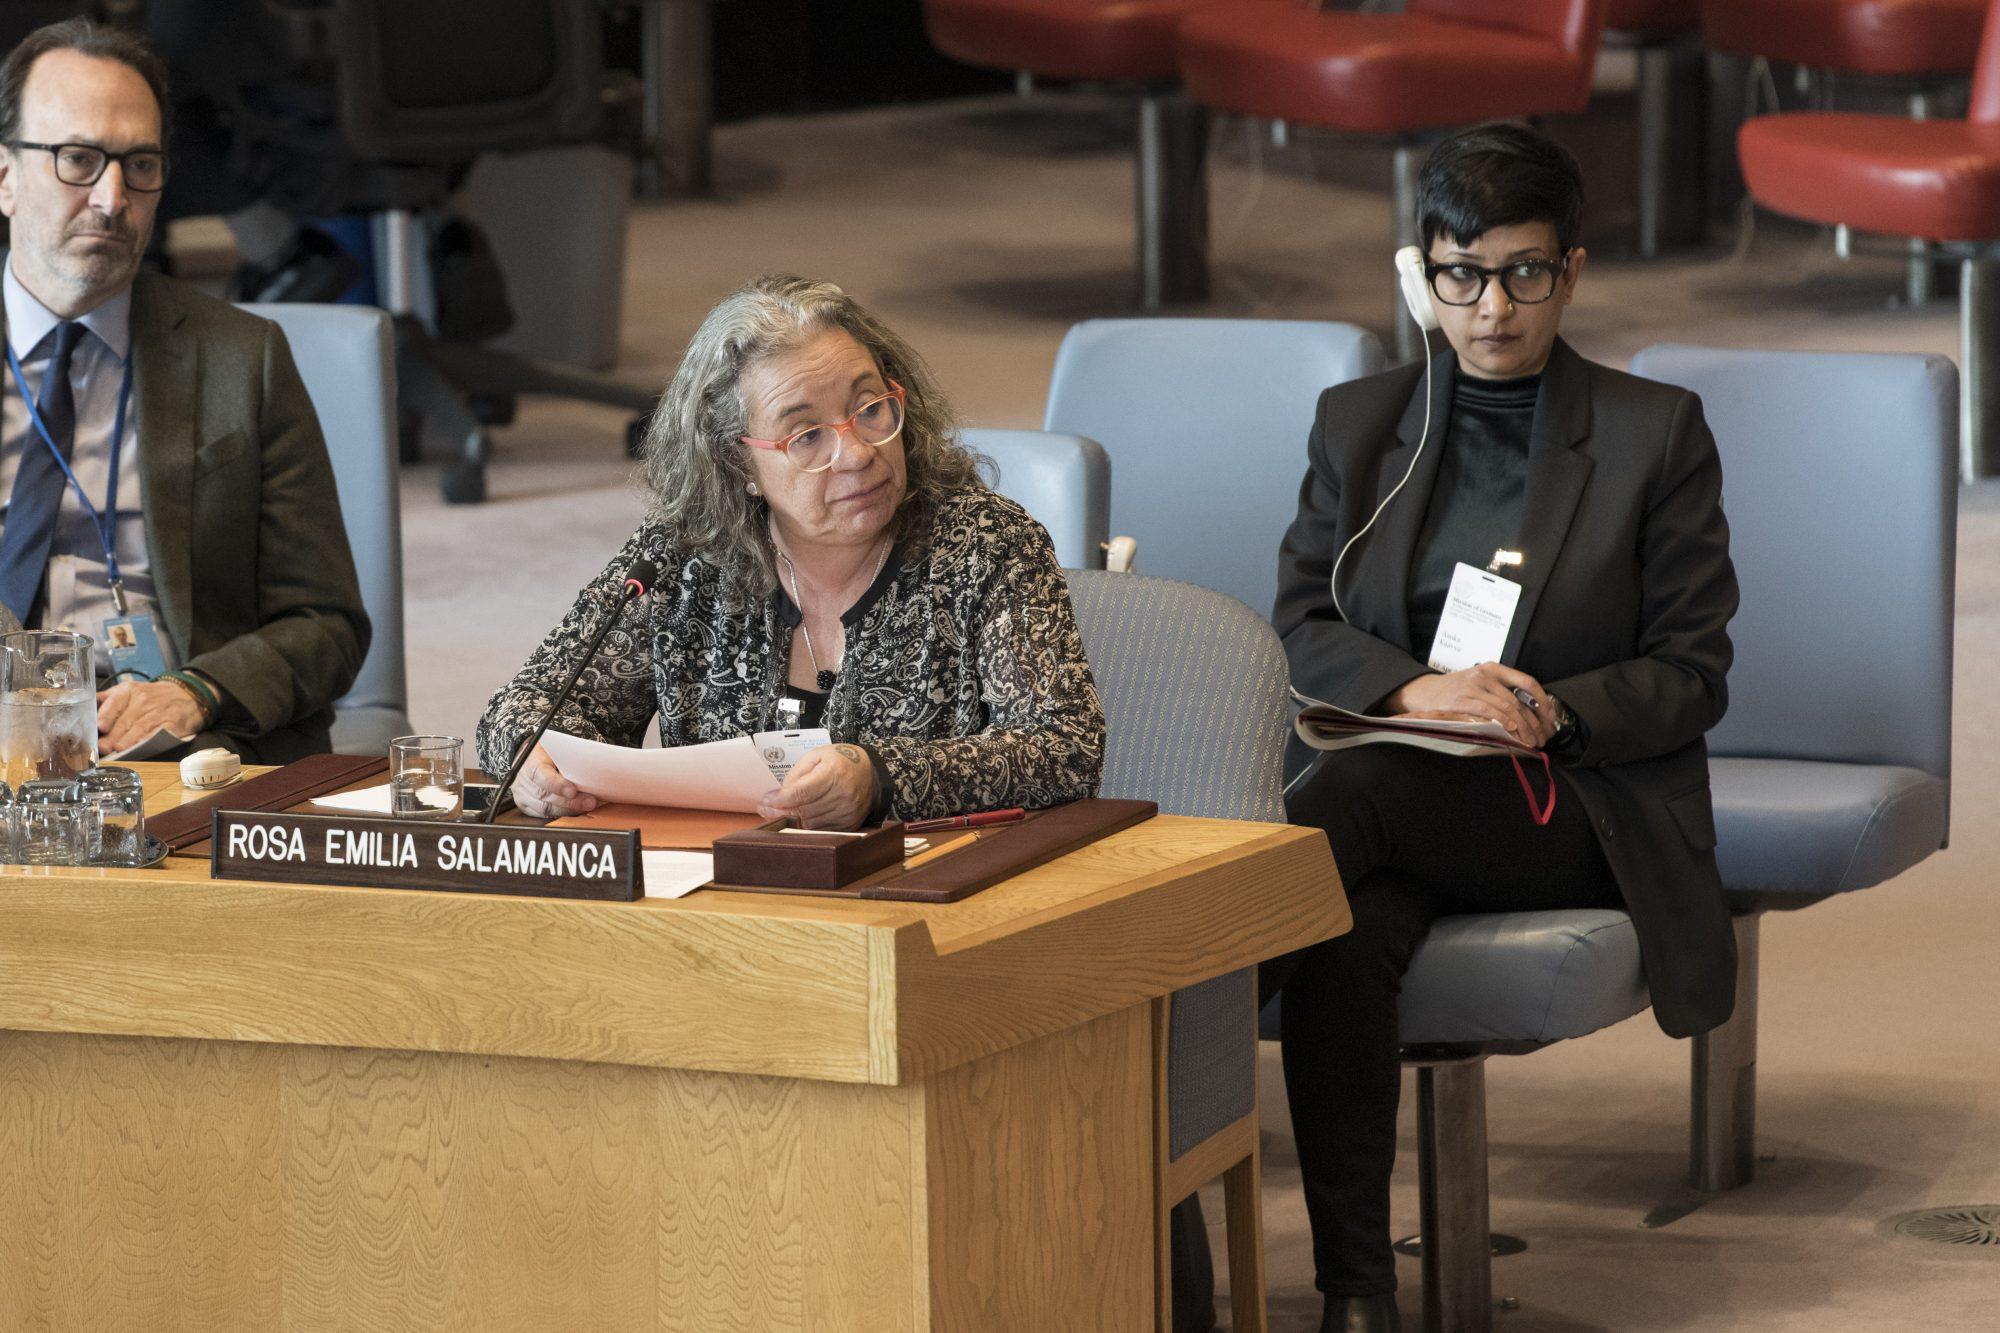 UN Security Council Briefing on Colombia by Rosa Emilia Salamanca